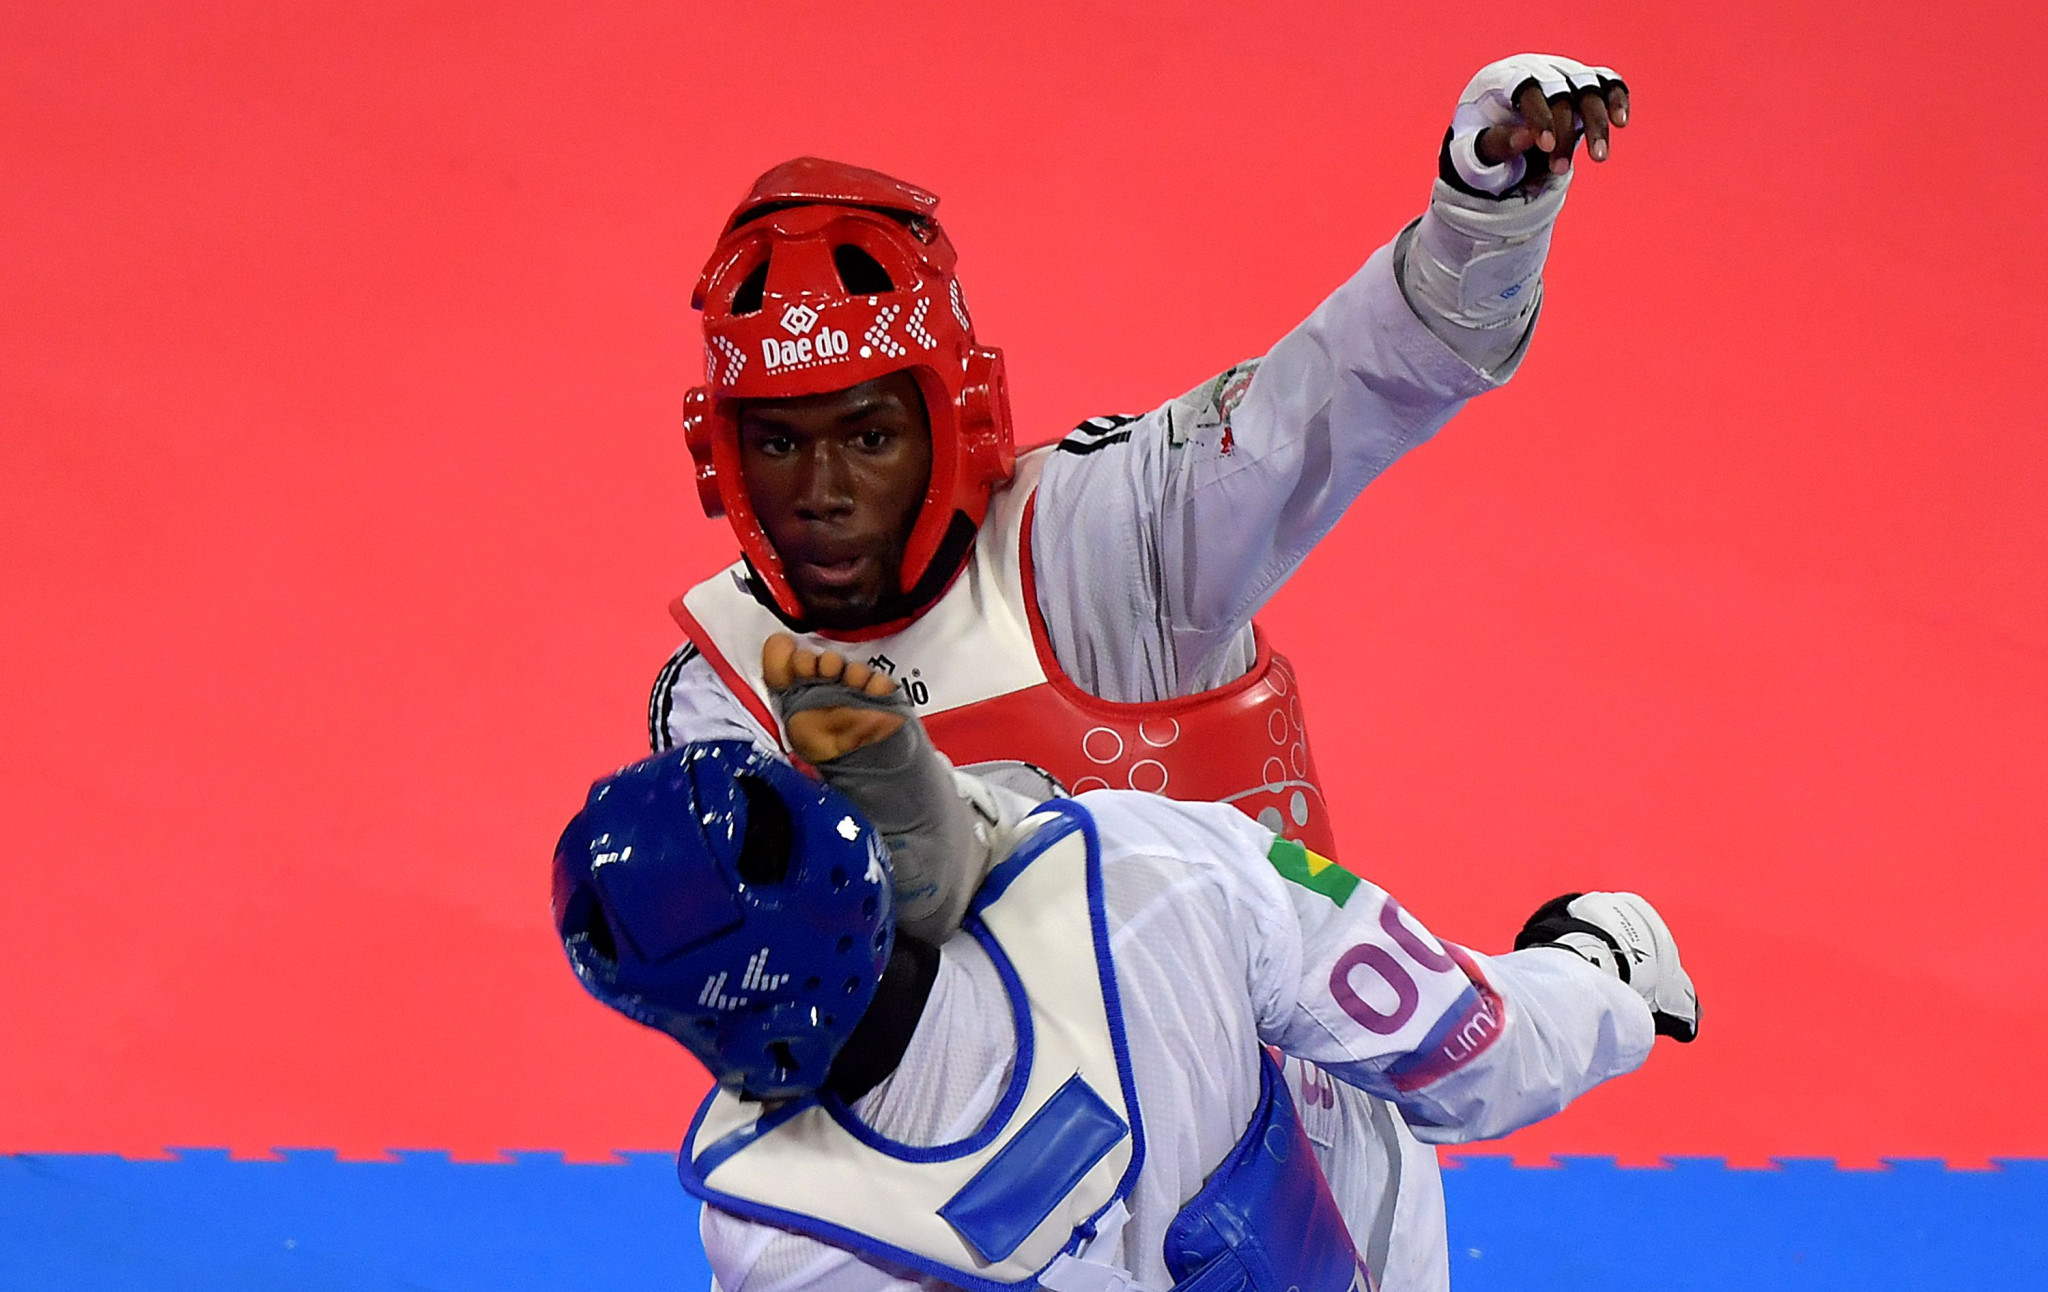 Taekwondo star Pié charts course to Tokyo 2020 after winning national award